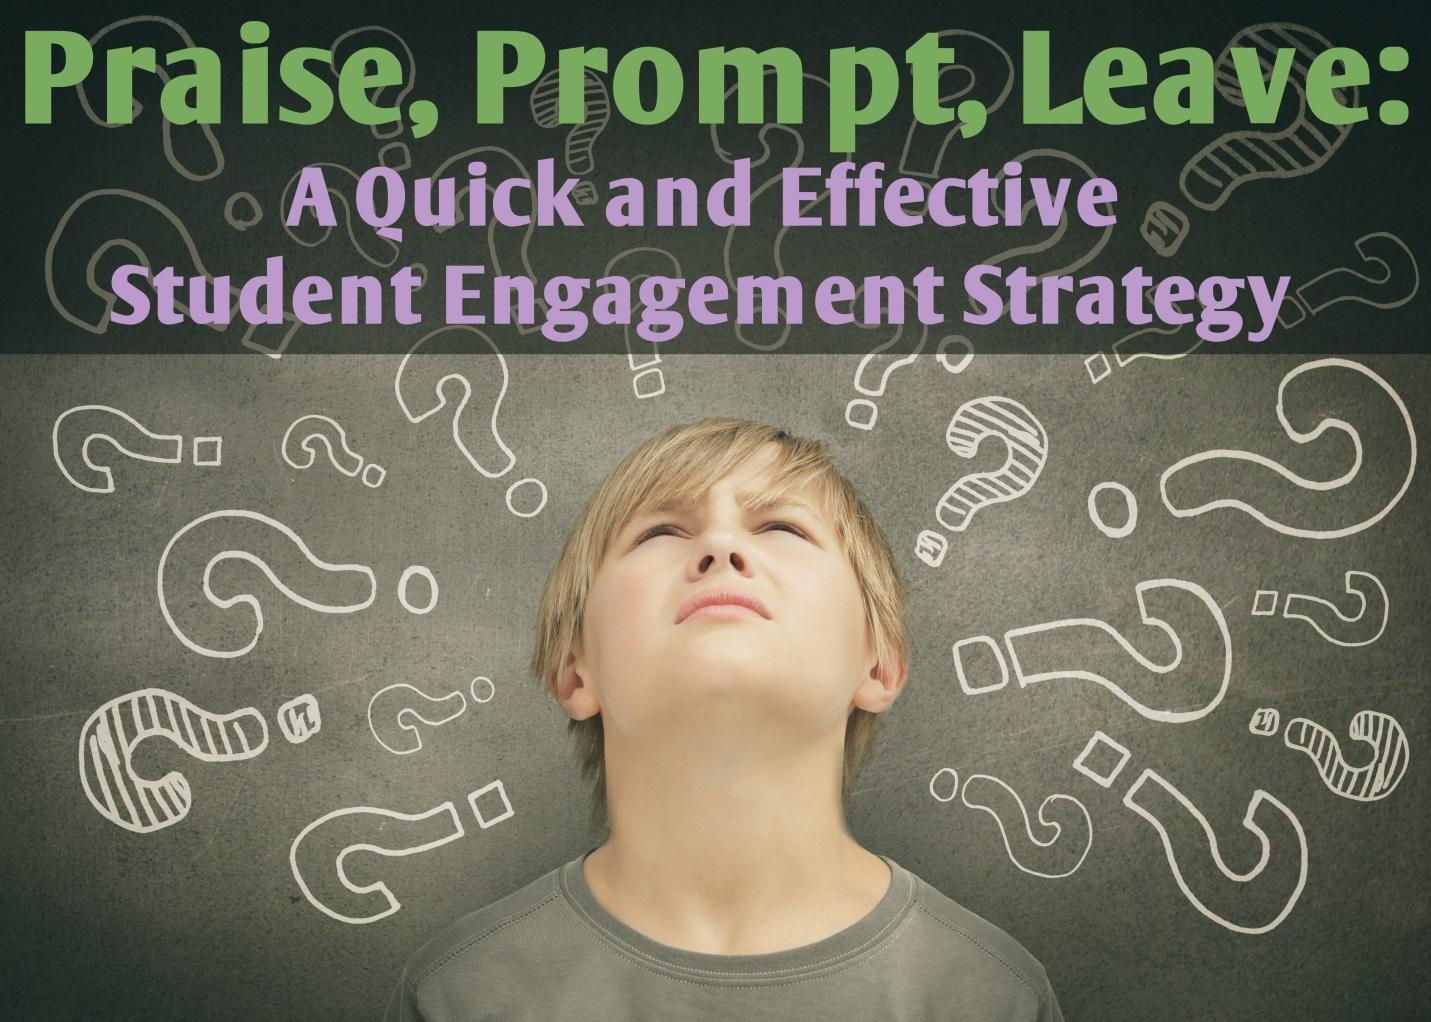 student_engagement-3